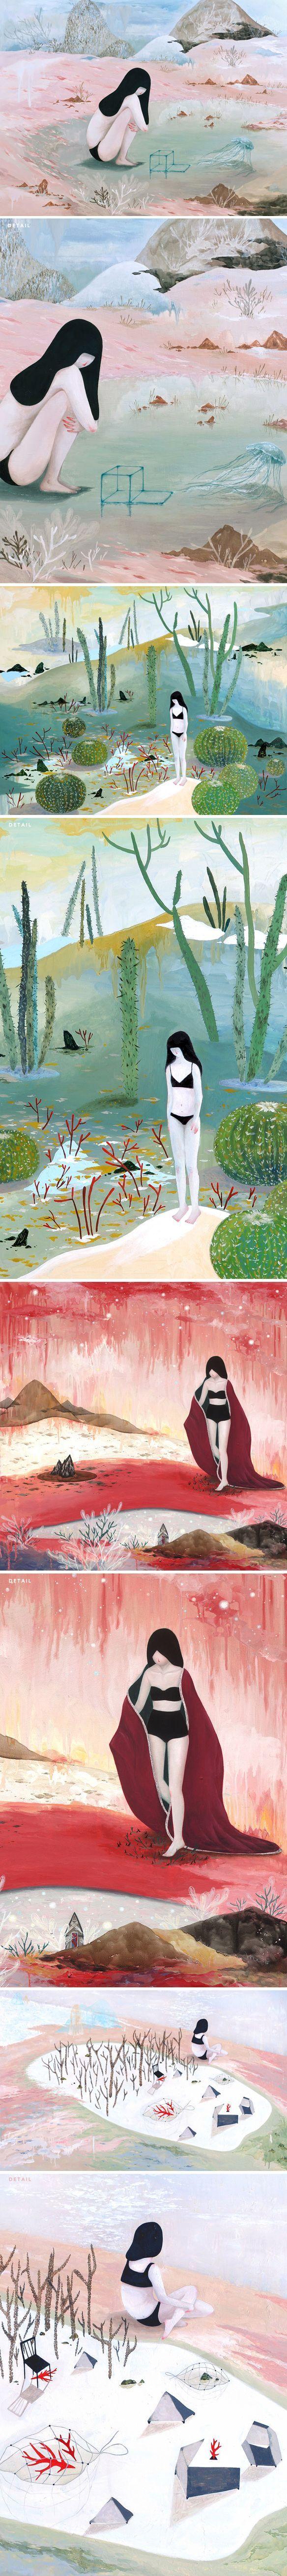 mandy cao (on The Jealous Curator blog)